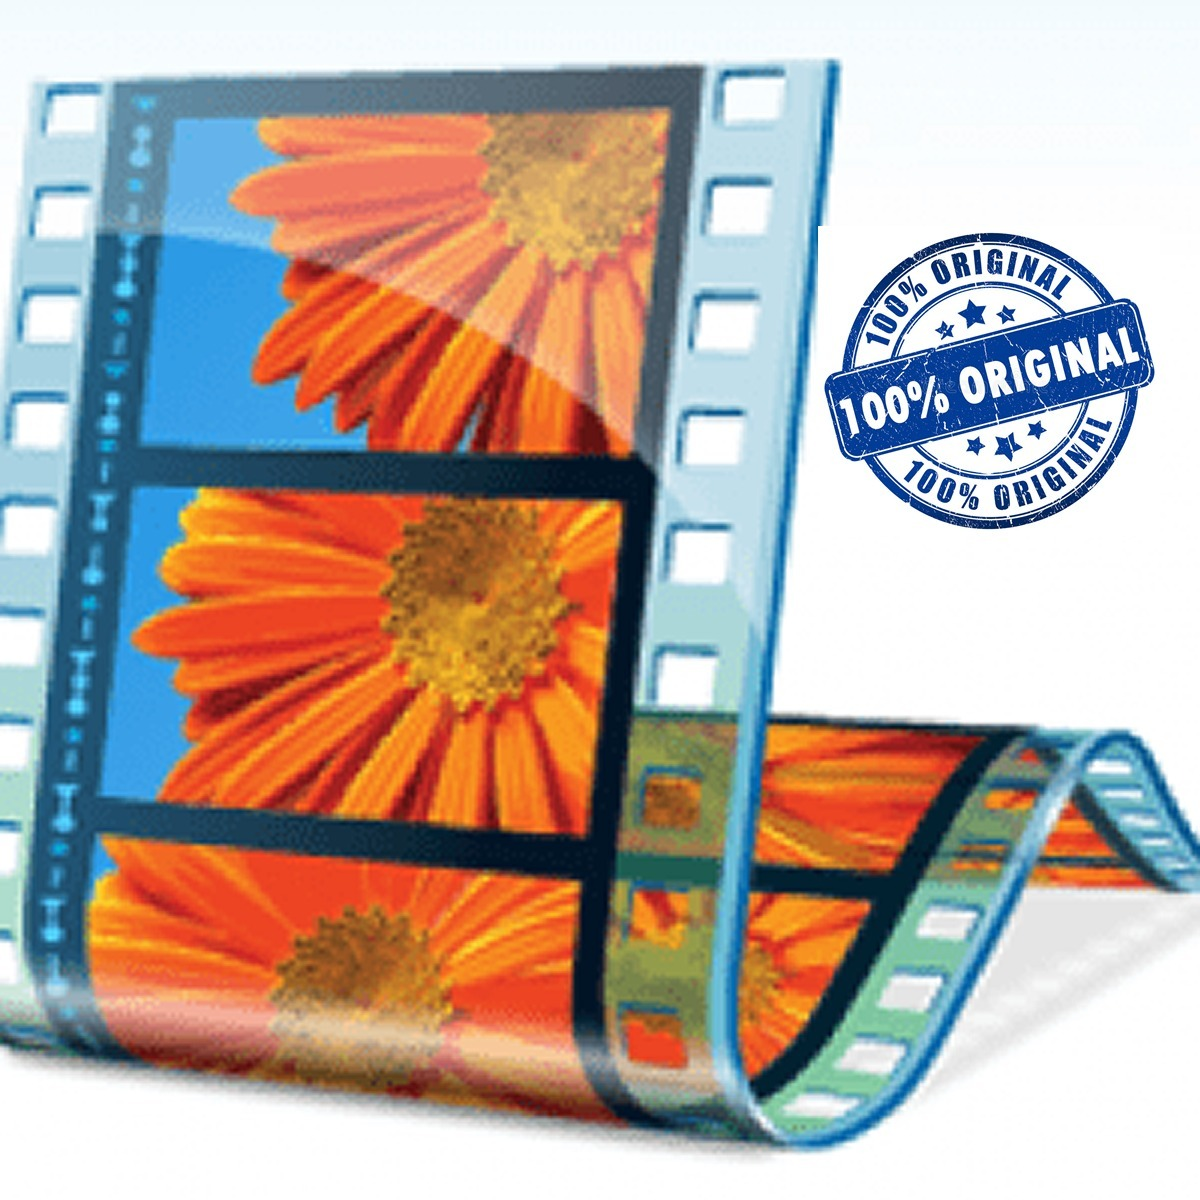 windows movie maker windows 788110 curso b225sico r